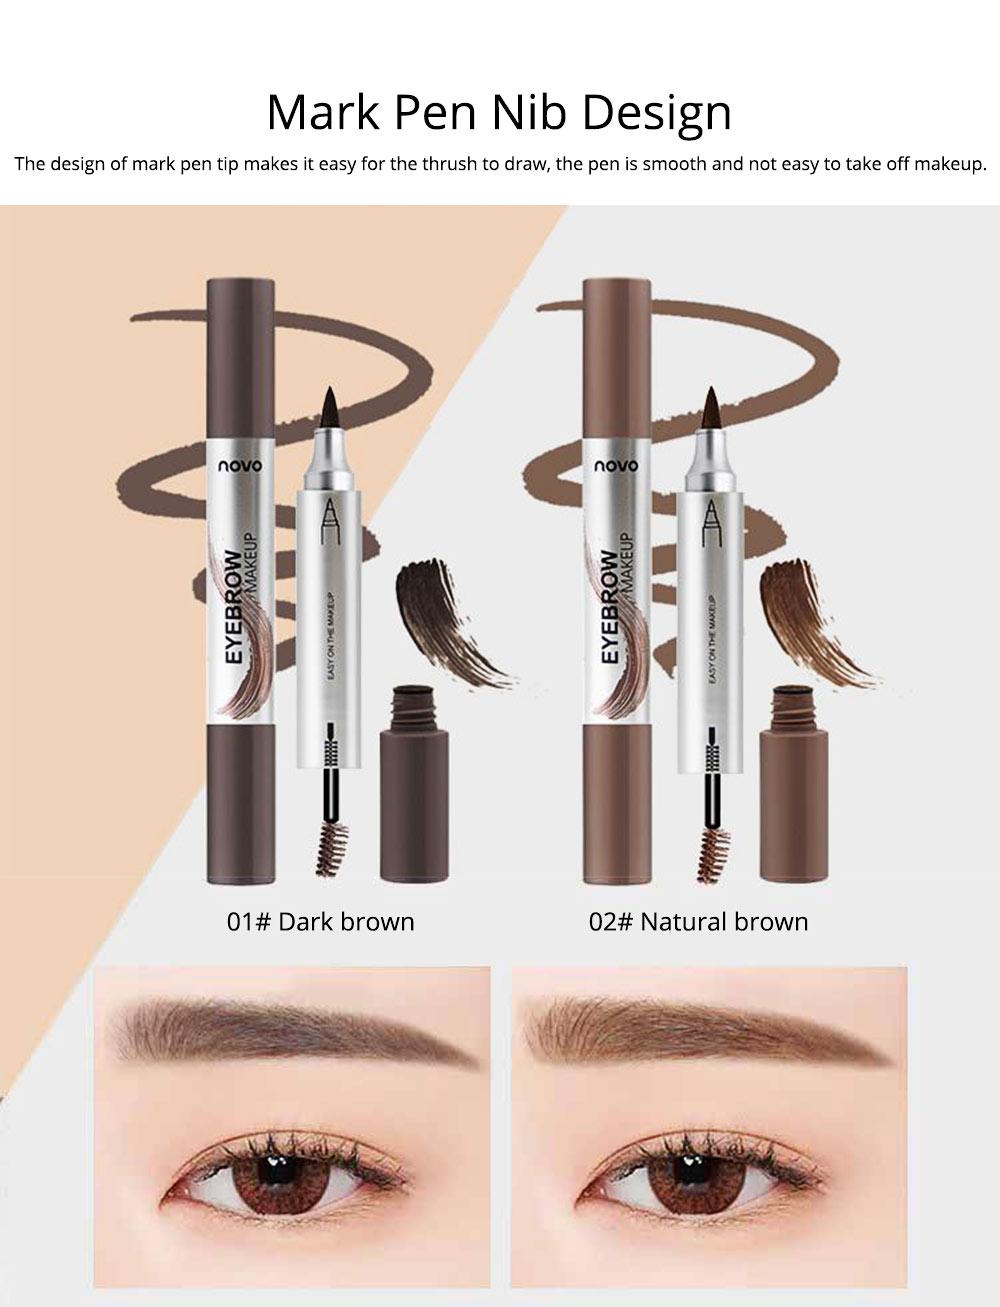 Dye Cream Eyebrow, Mark Pen Nib Eyebrow Pencil, Waterproof Eyebrow Pencil with Brush 2 Colors Available 1